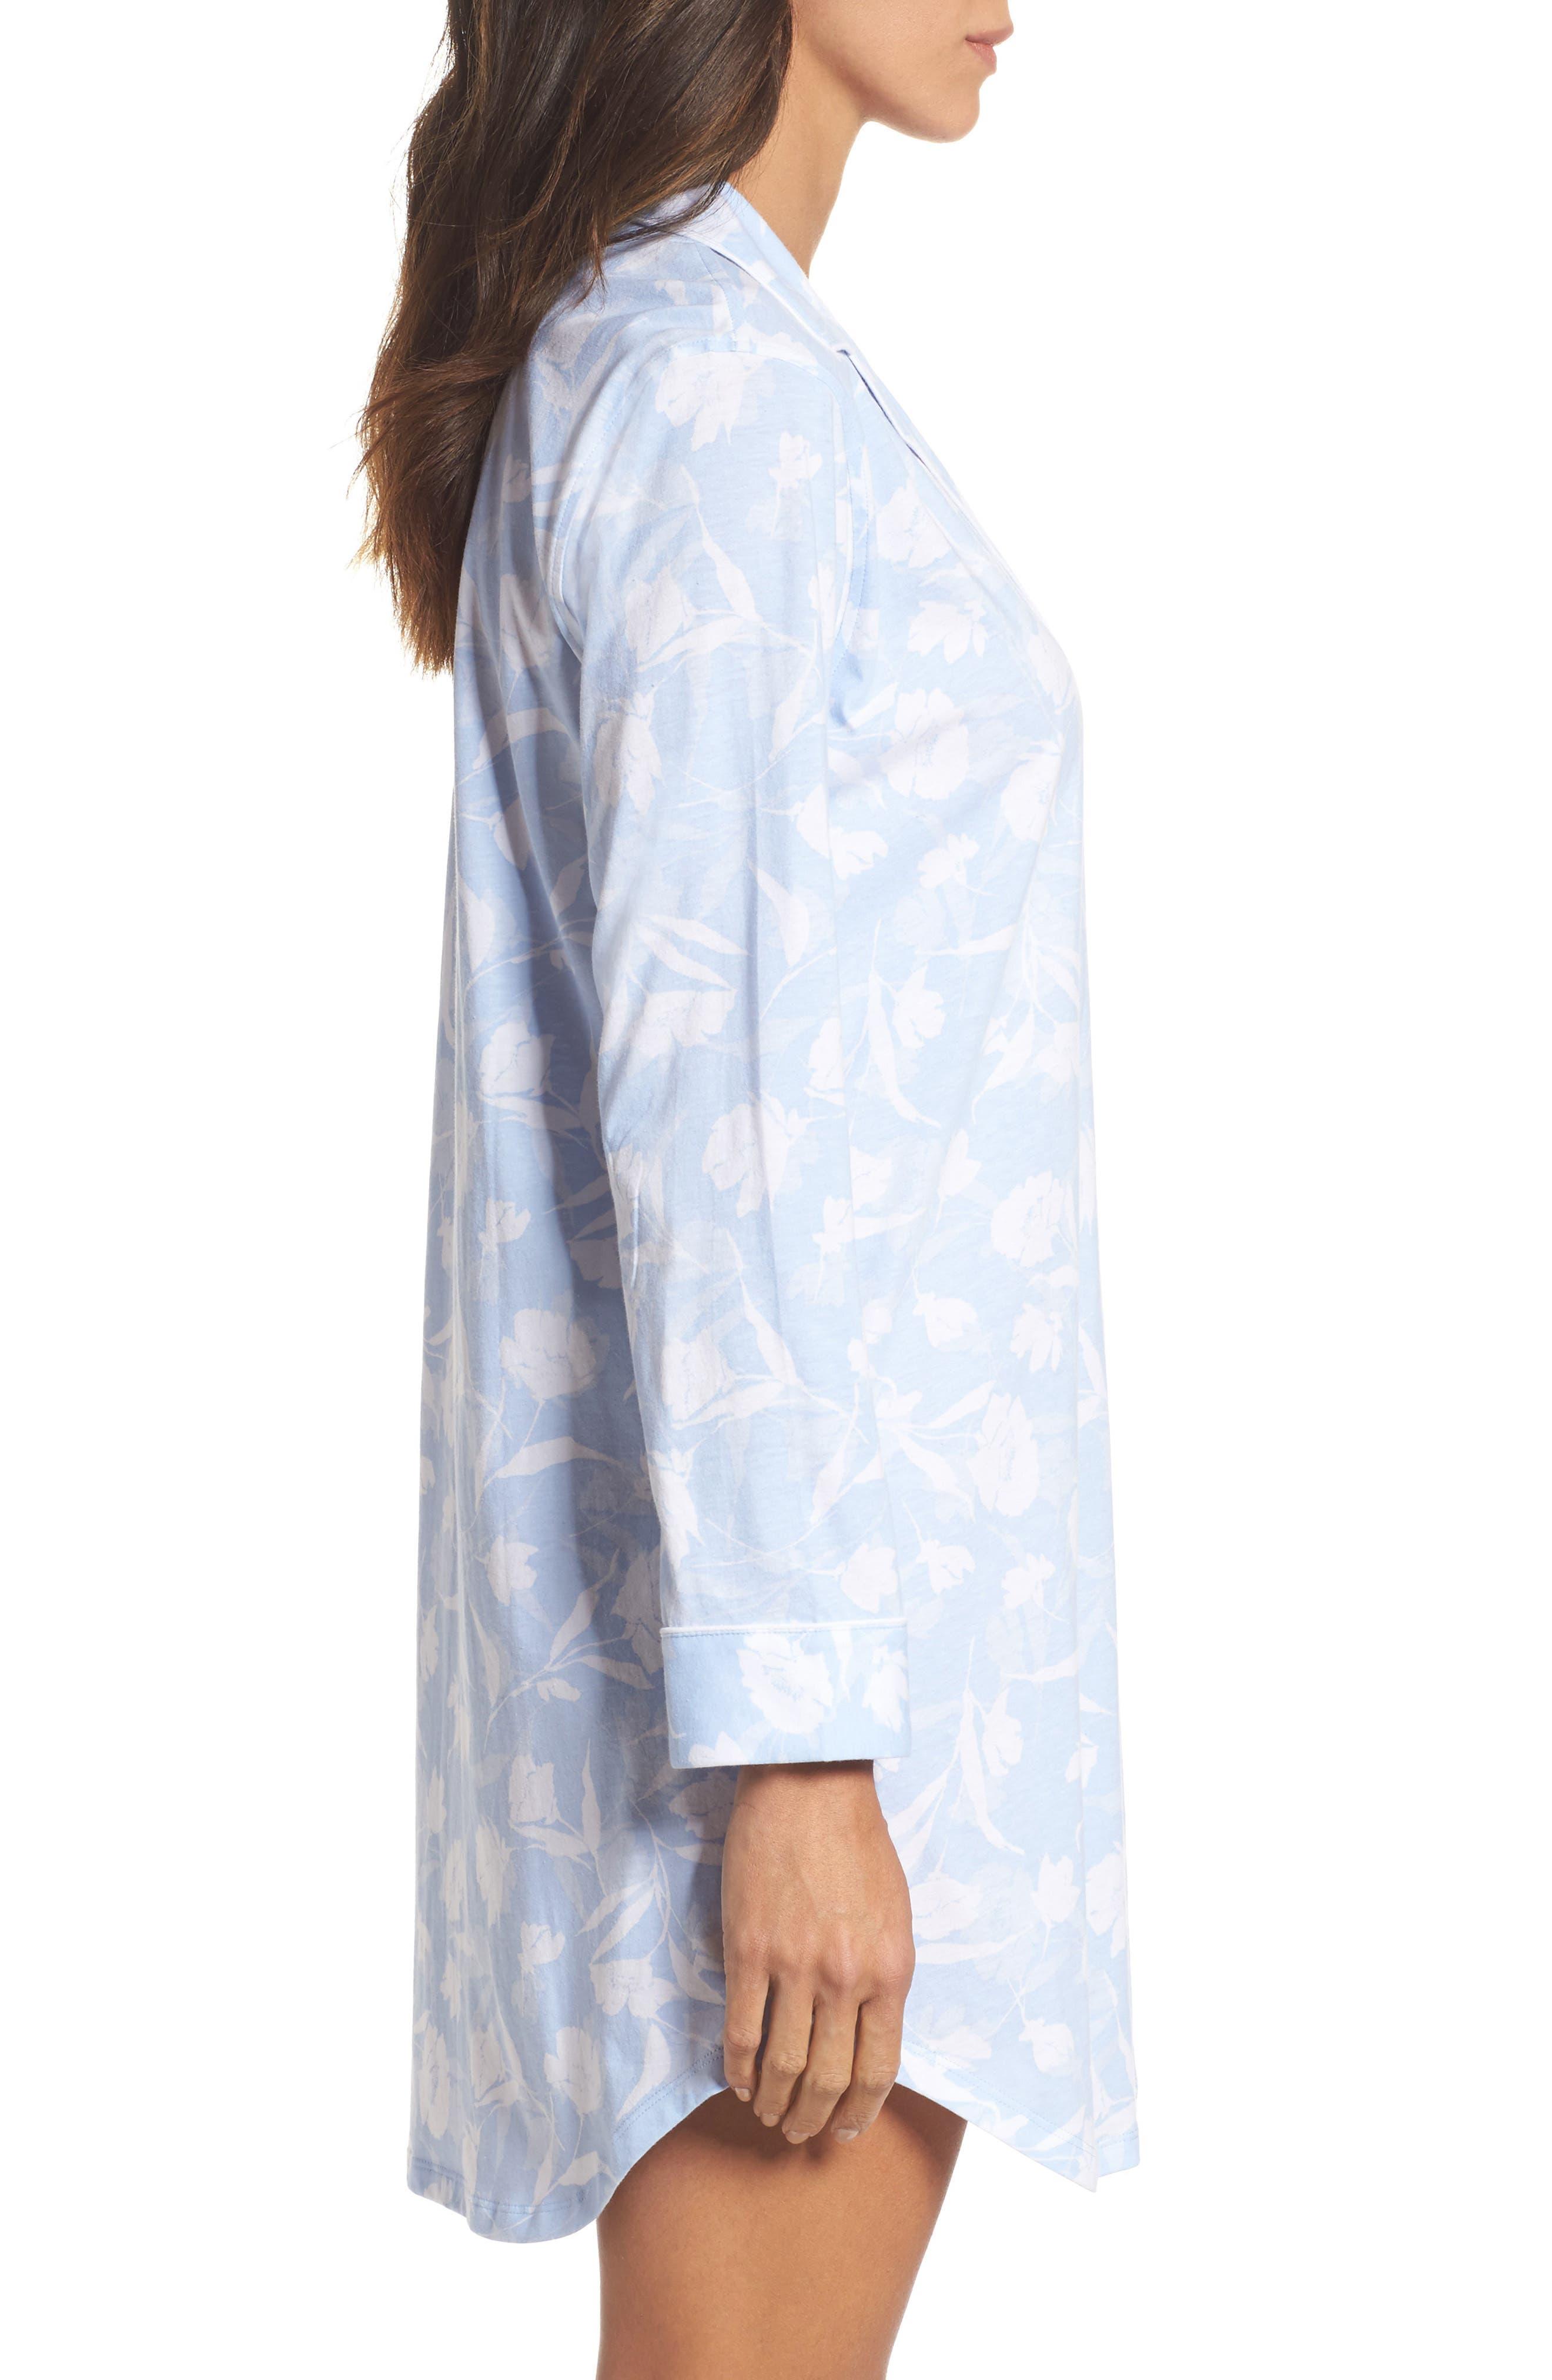 Notch Collar Sleep Shirt,                             Alternate thumbnail 3, color,                             Pale Blue Monotone Floral